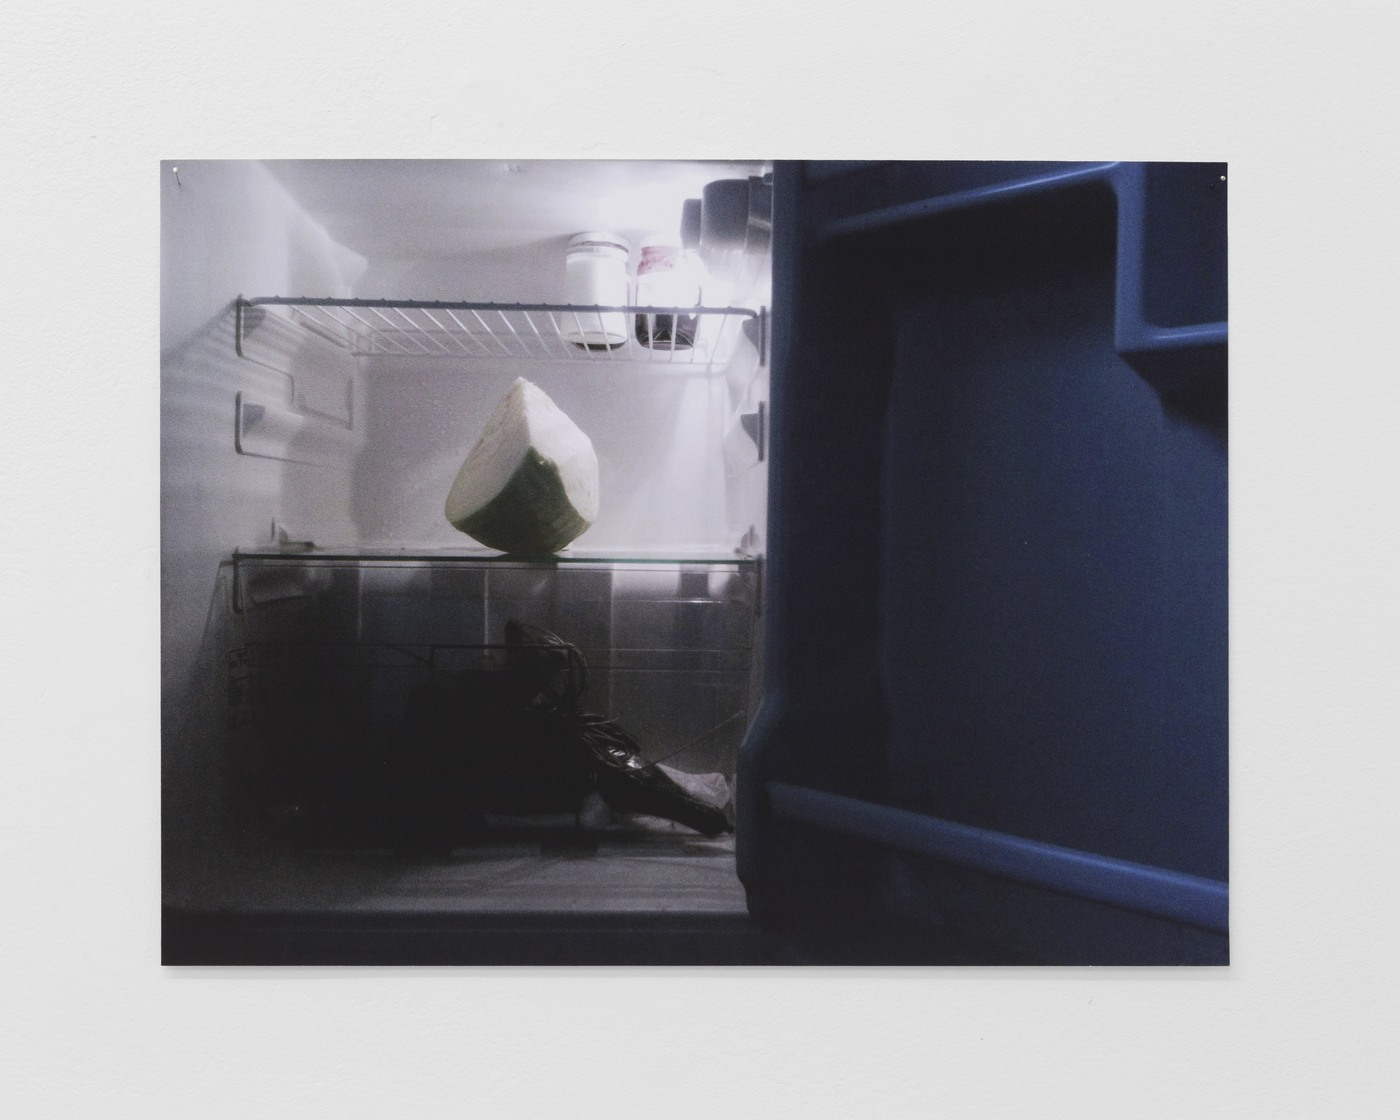 14_gkungrefrigerator1